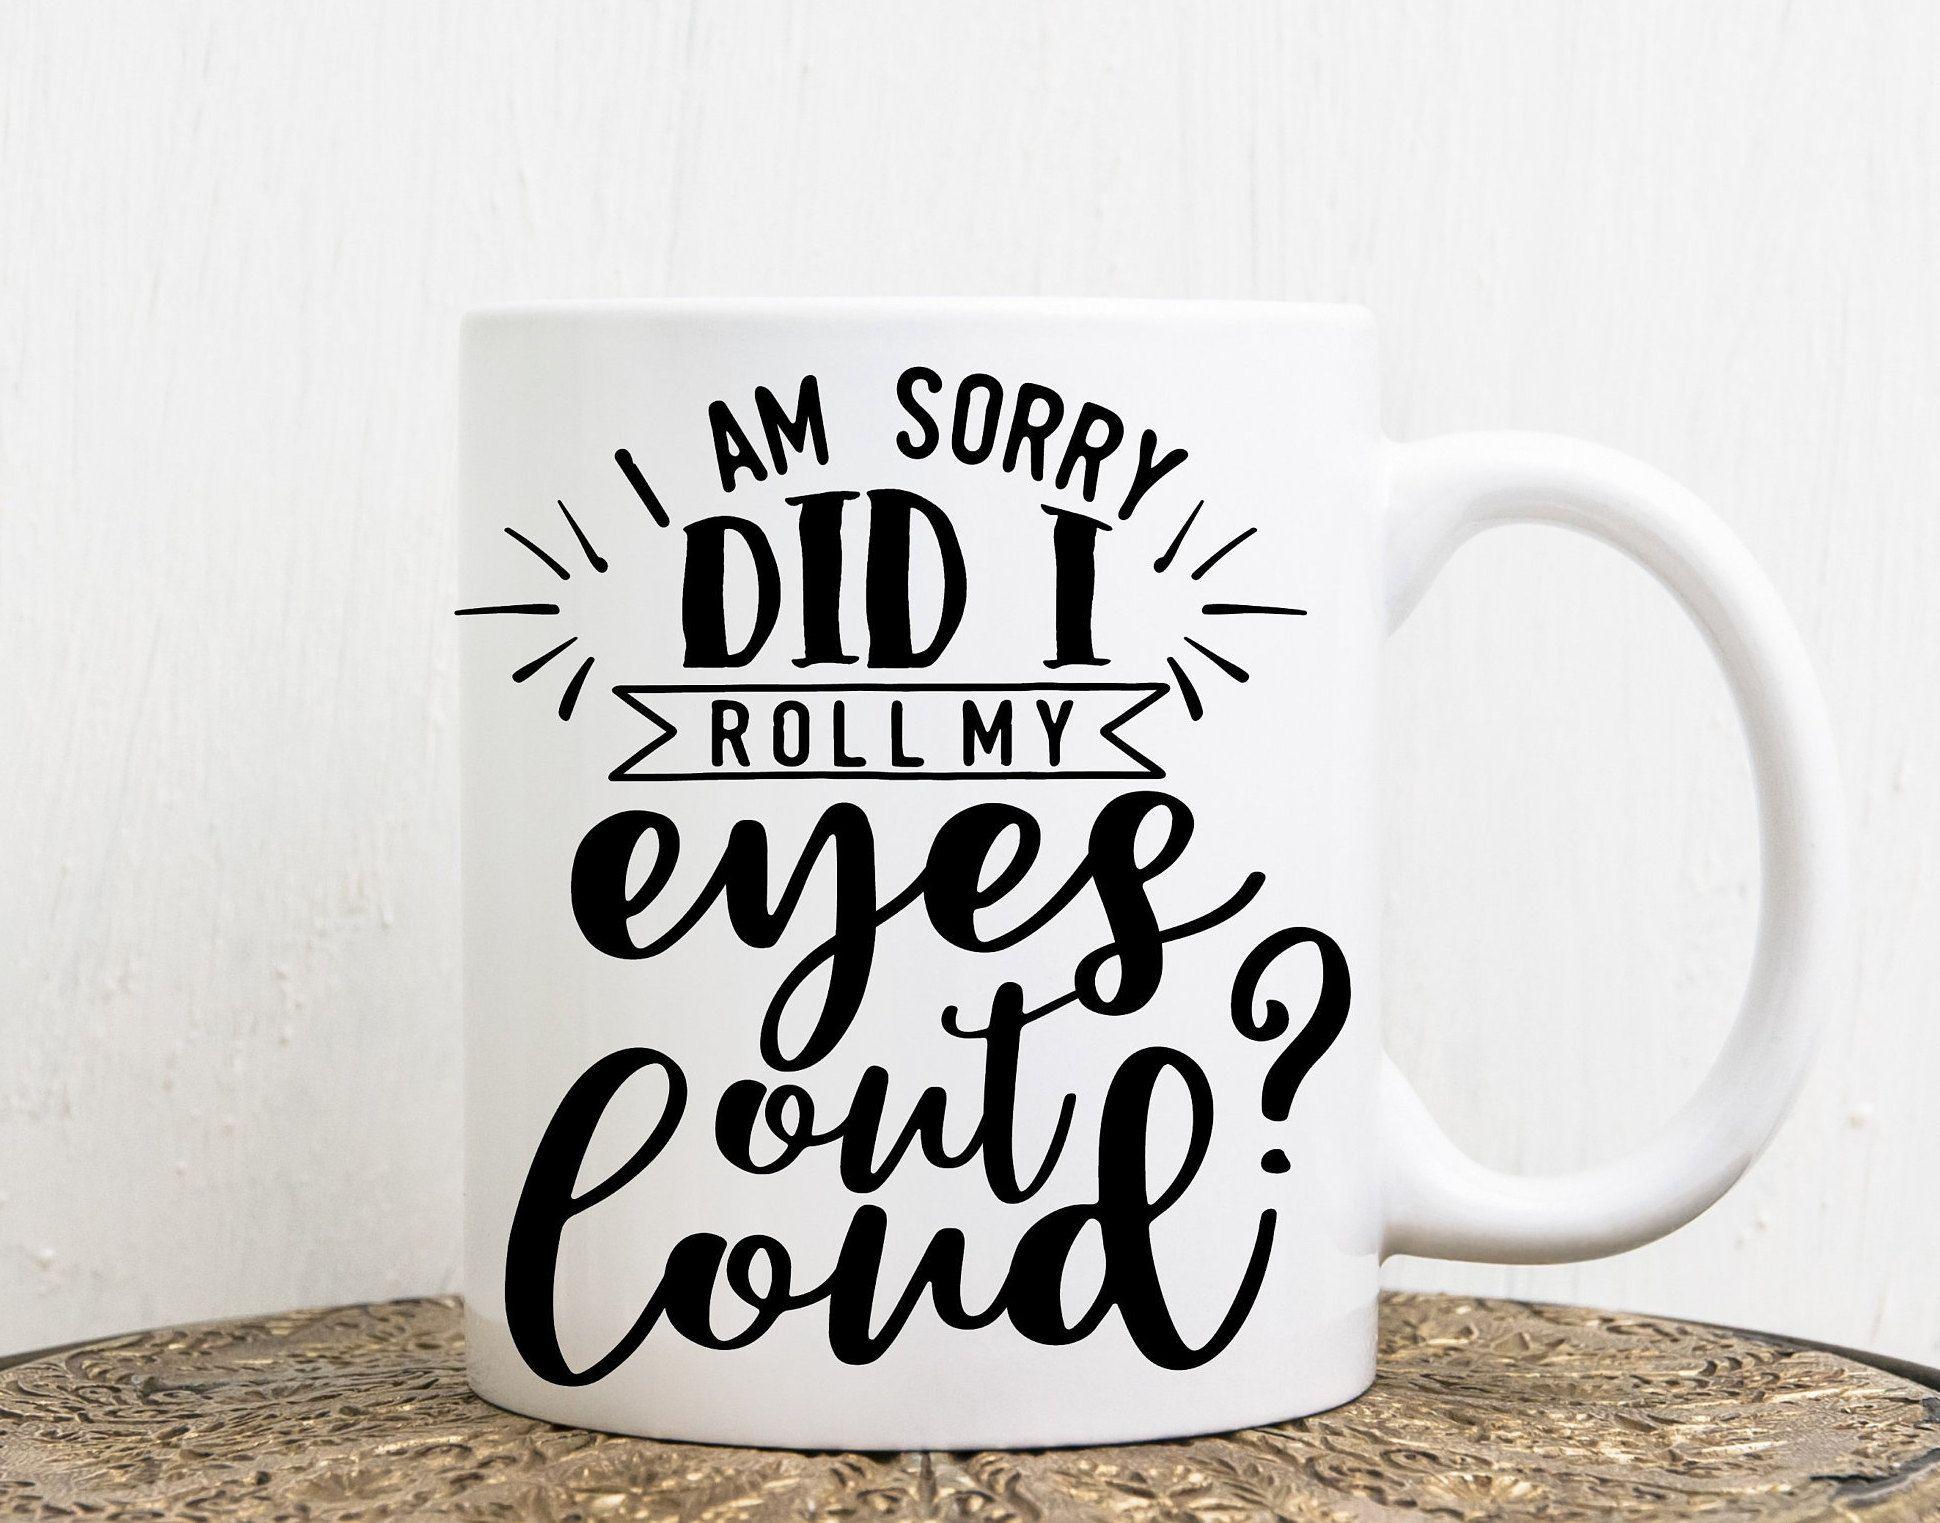 Coffee Cup Funny Coffee Mug Sassy Travel Mug Personalized Coffee Tumbler Sarcastic Coffee Mug Sorry Co Funny Coffee Cups Quotes For Mugs Coffee Humor